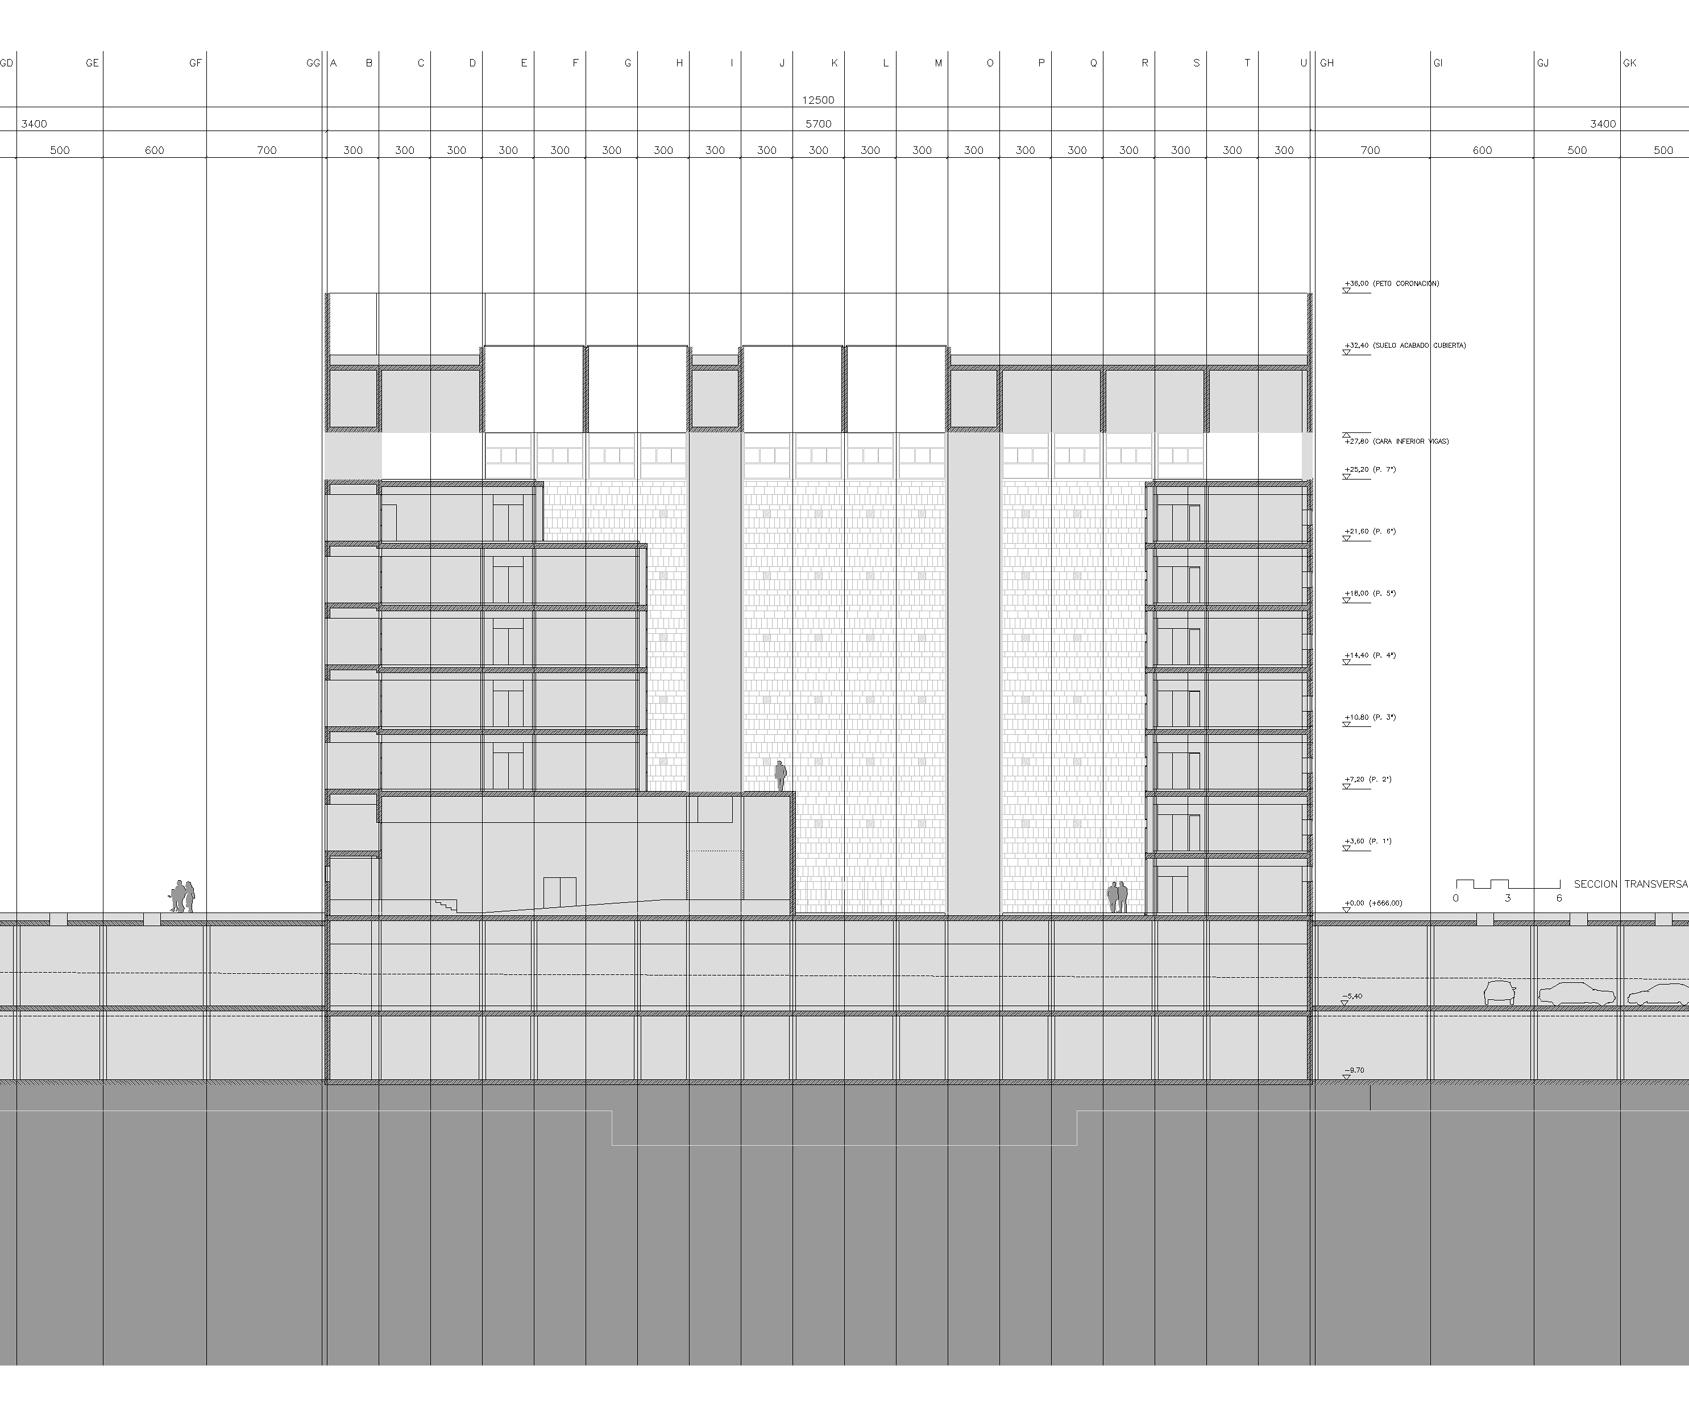 Galer a cl sicos de arquitectura caja granada for Bmn caja granada oficinas